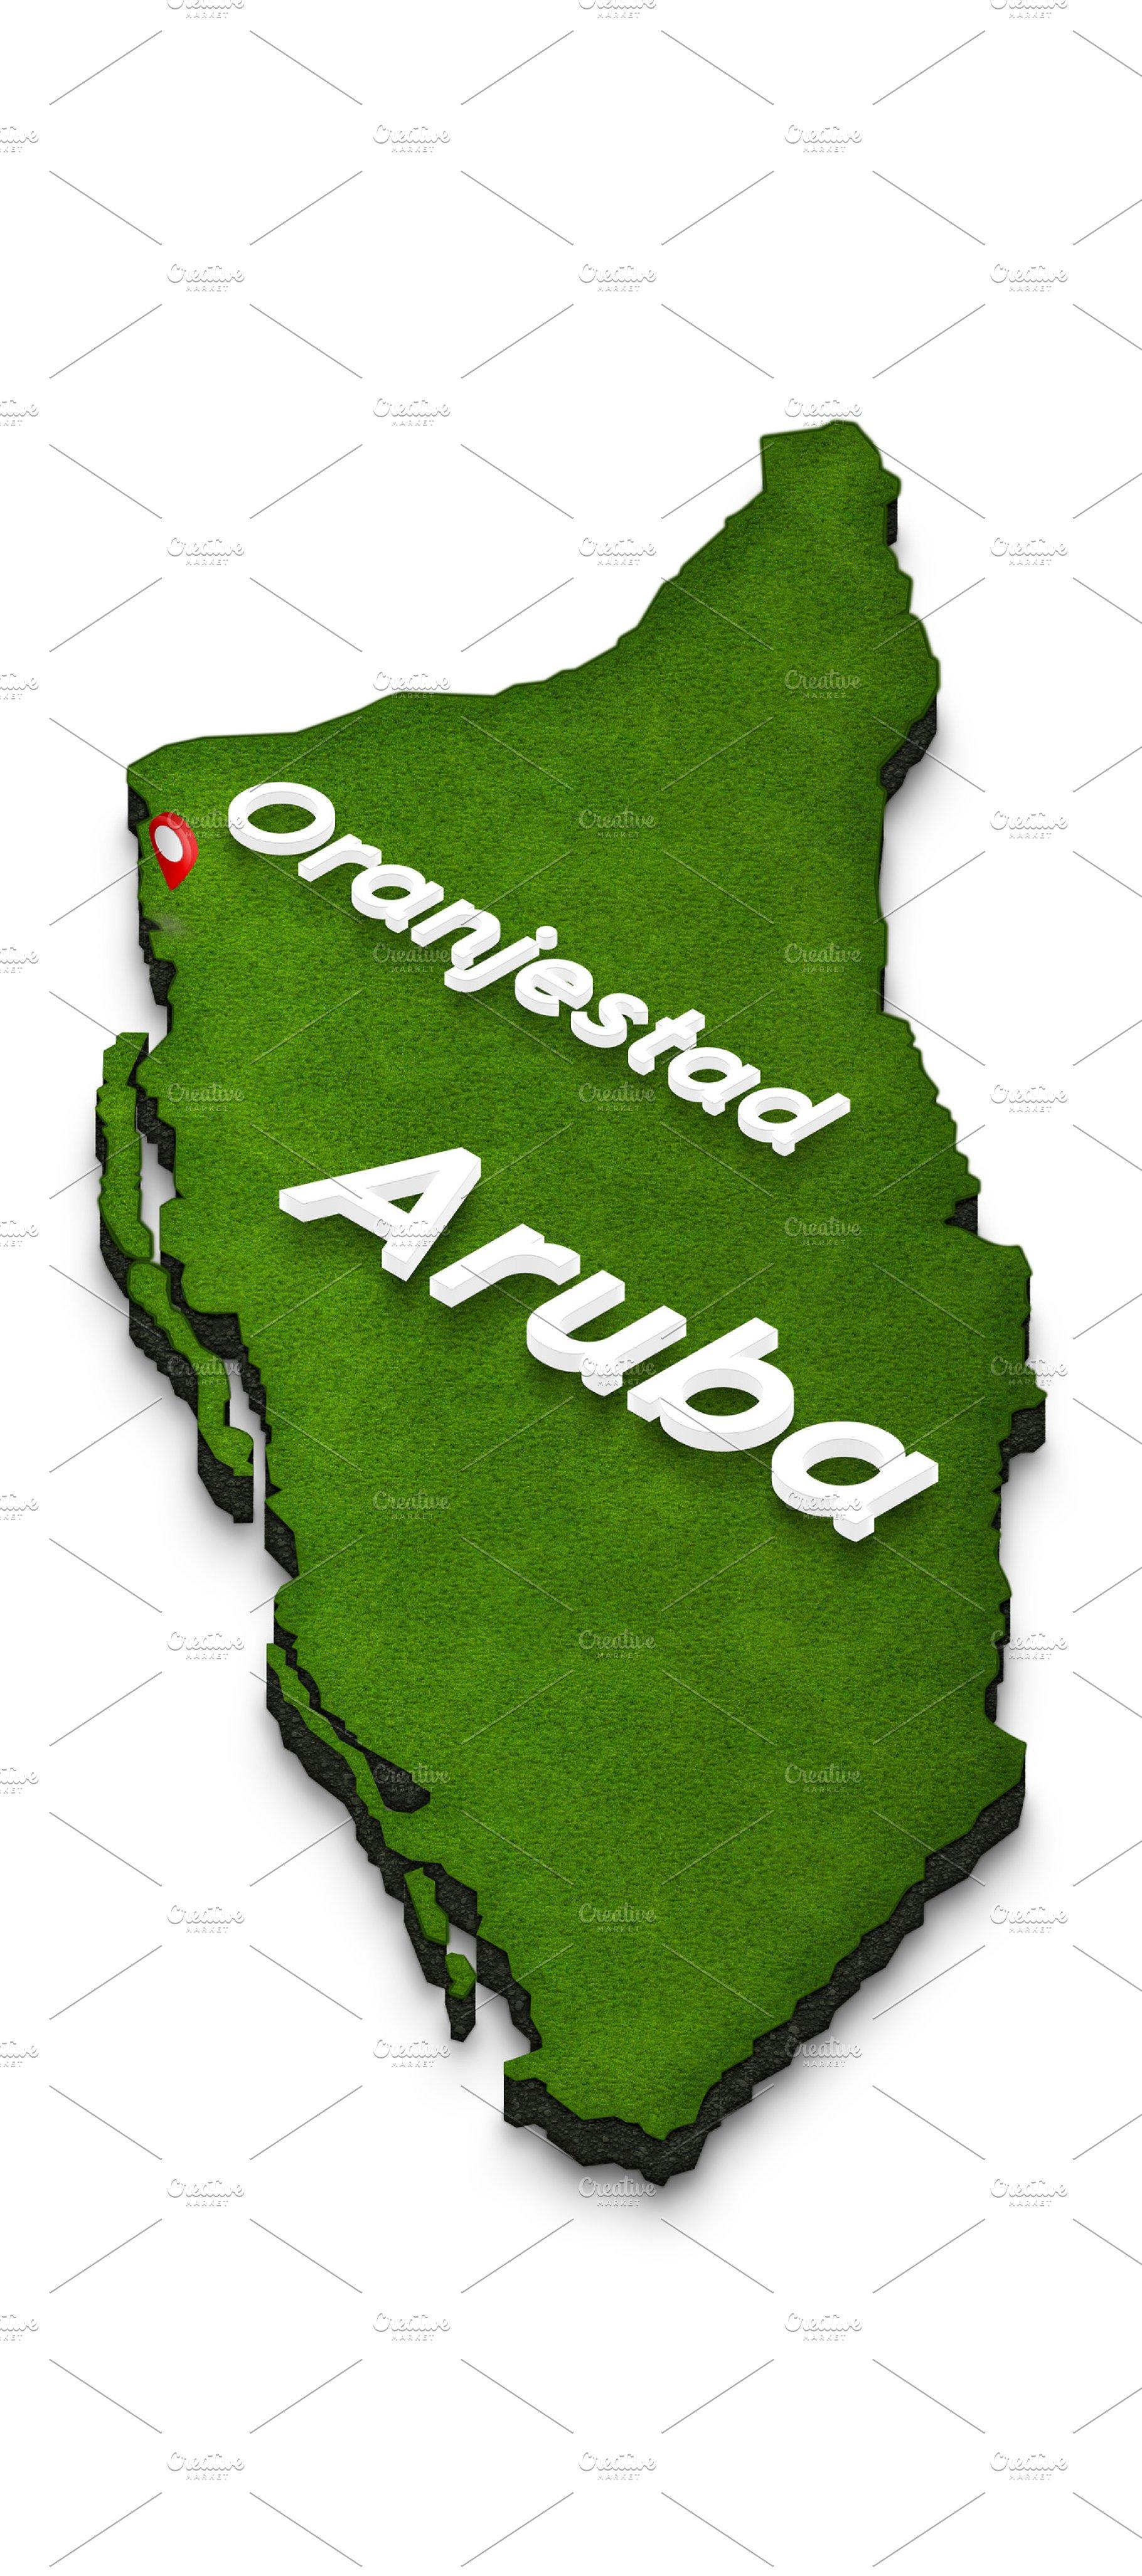 Map of Aruba Map Of Aruba on map of caribbean, map of antigua, map of dominican republic, aruba phoenix, aruba marriott ocean club, aruba golf, map of jamaica, map of bahamas, map of belize, map of oranjestad, dining in aruba, map of bonaire, map of antilles, map of grenada, entertainment in aruba, map of atlantic ocean, aruba activities, map of mexico, map of south america, map of belgium, aruba shopping, map of bermuda, occidental grand aruba, map of united states, divi village, map of virgin islands, flying to aruba, aruba casinos, map of puerto rico, aruba renaissance, map of curacao, map of venezuala, aruba attractions, aruba beach club,